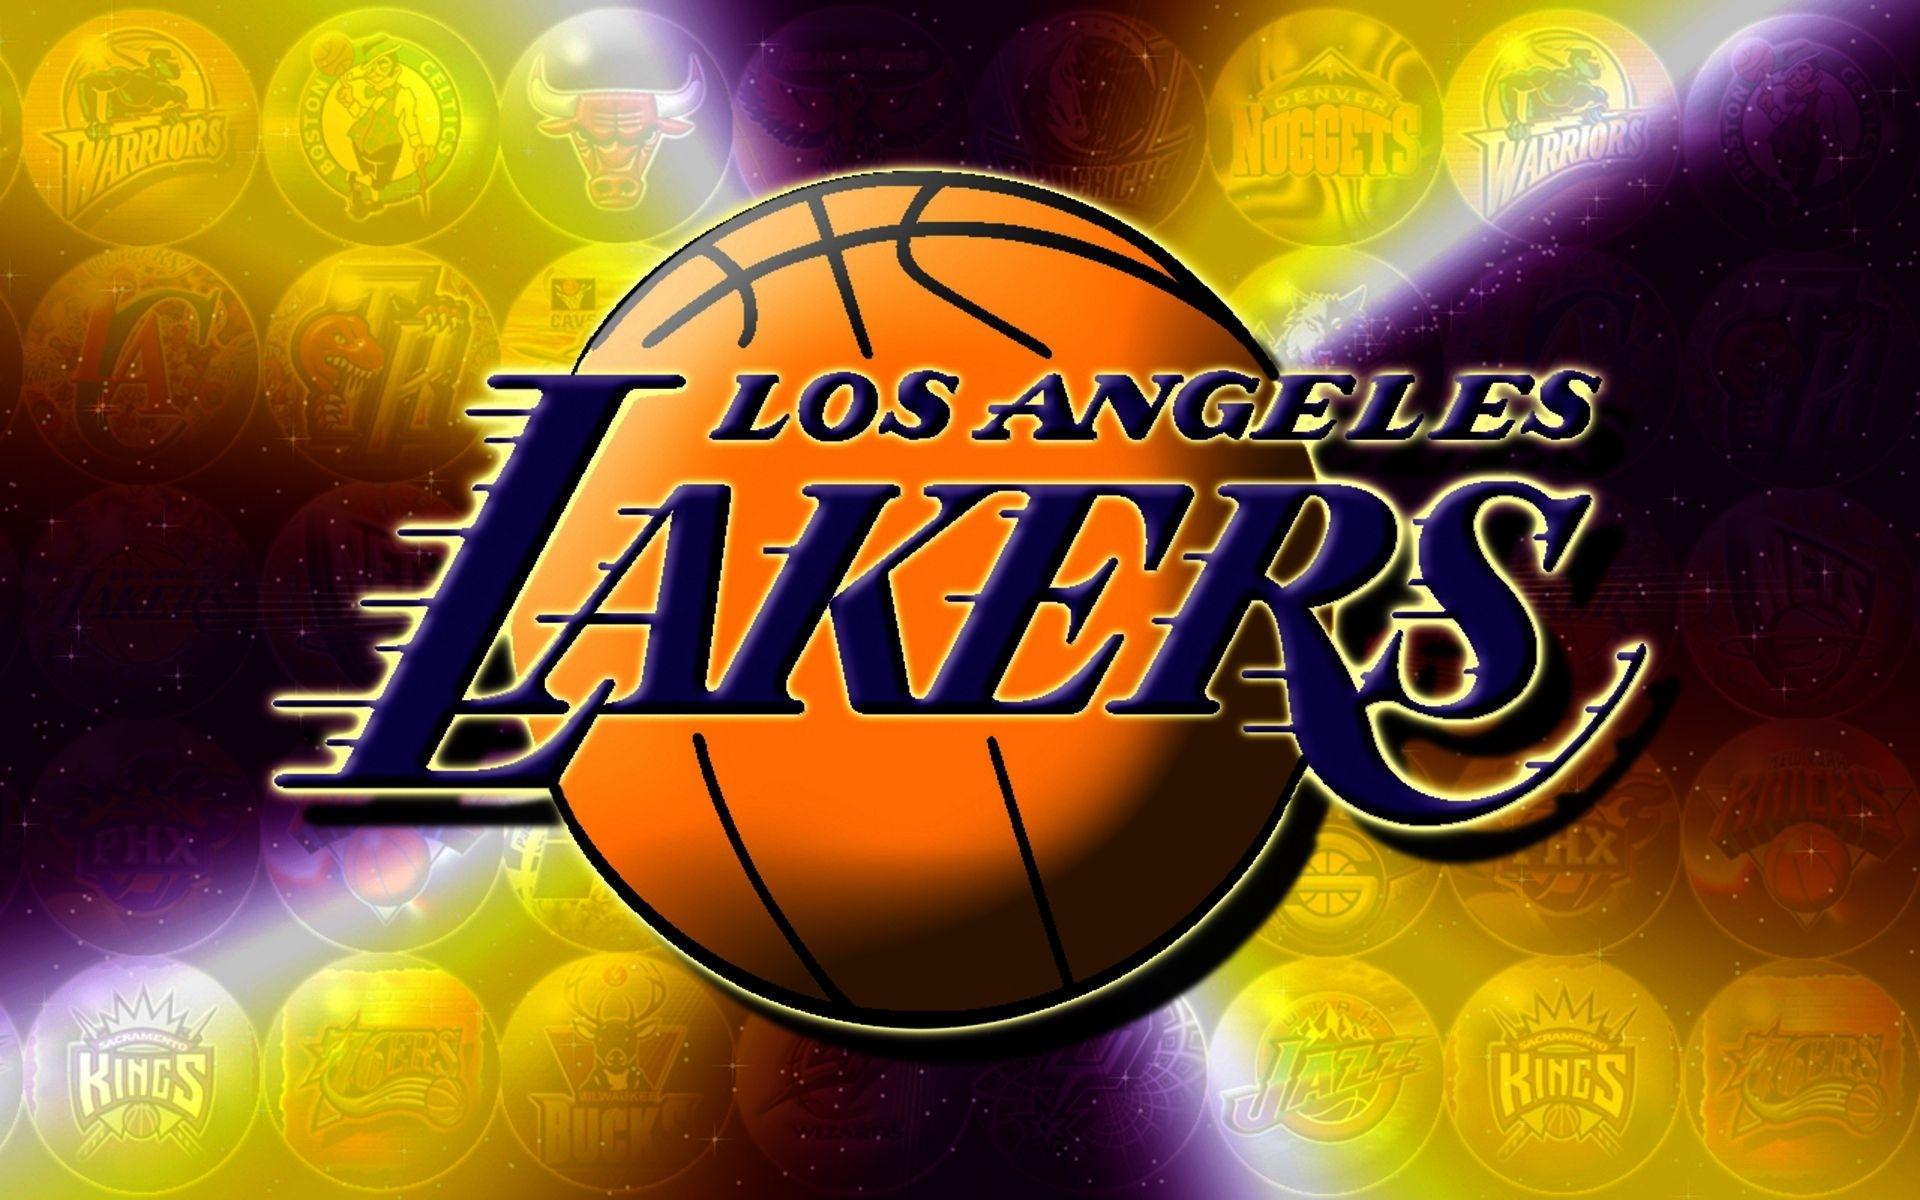 lakers logo | la lakers 3d logo | fave sport team | pinterest | la